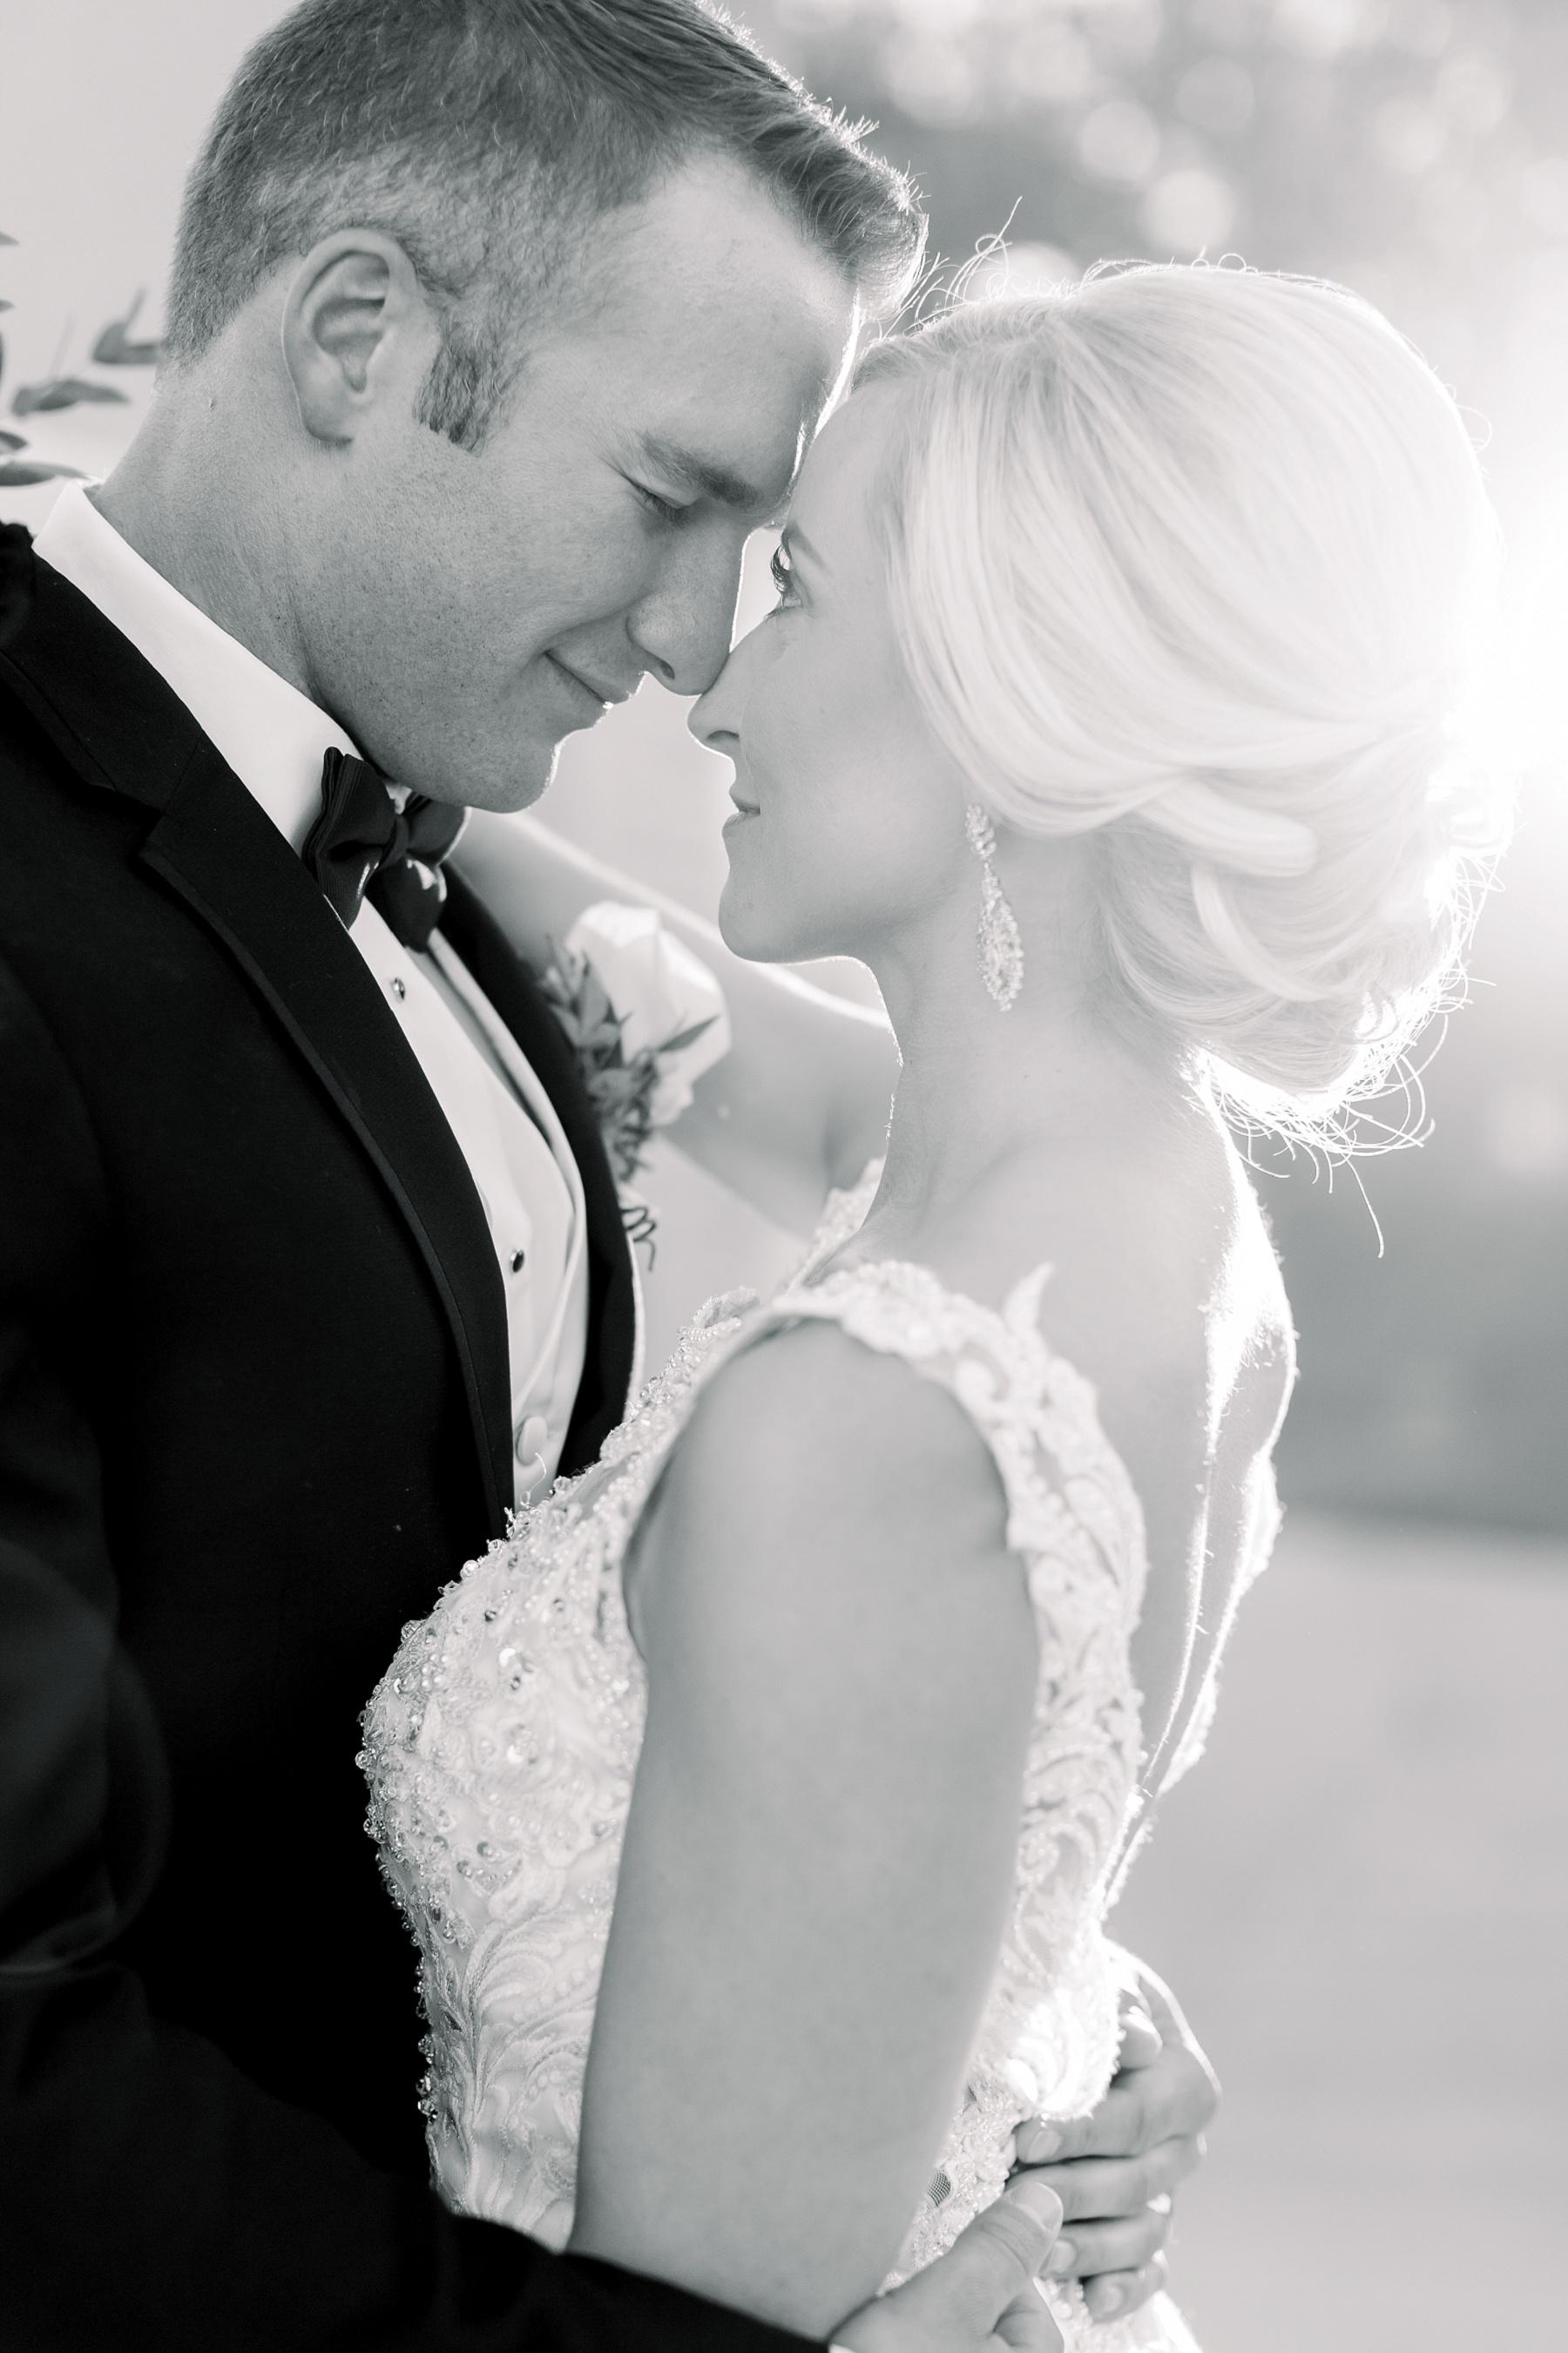 midwest-adventurous-wedding-photographer-elizabeth-ladean-photography-photo_4815.jpg